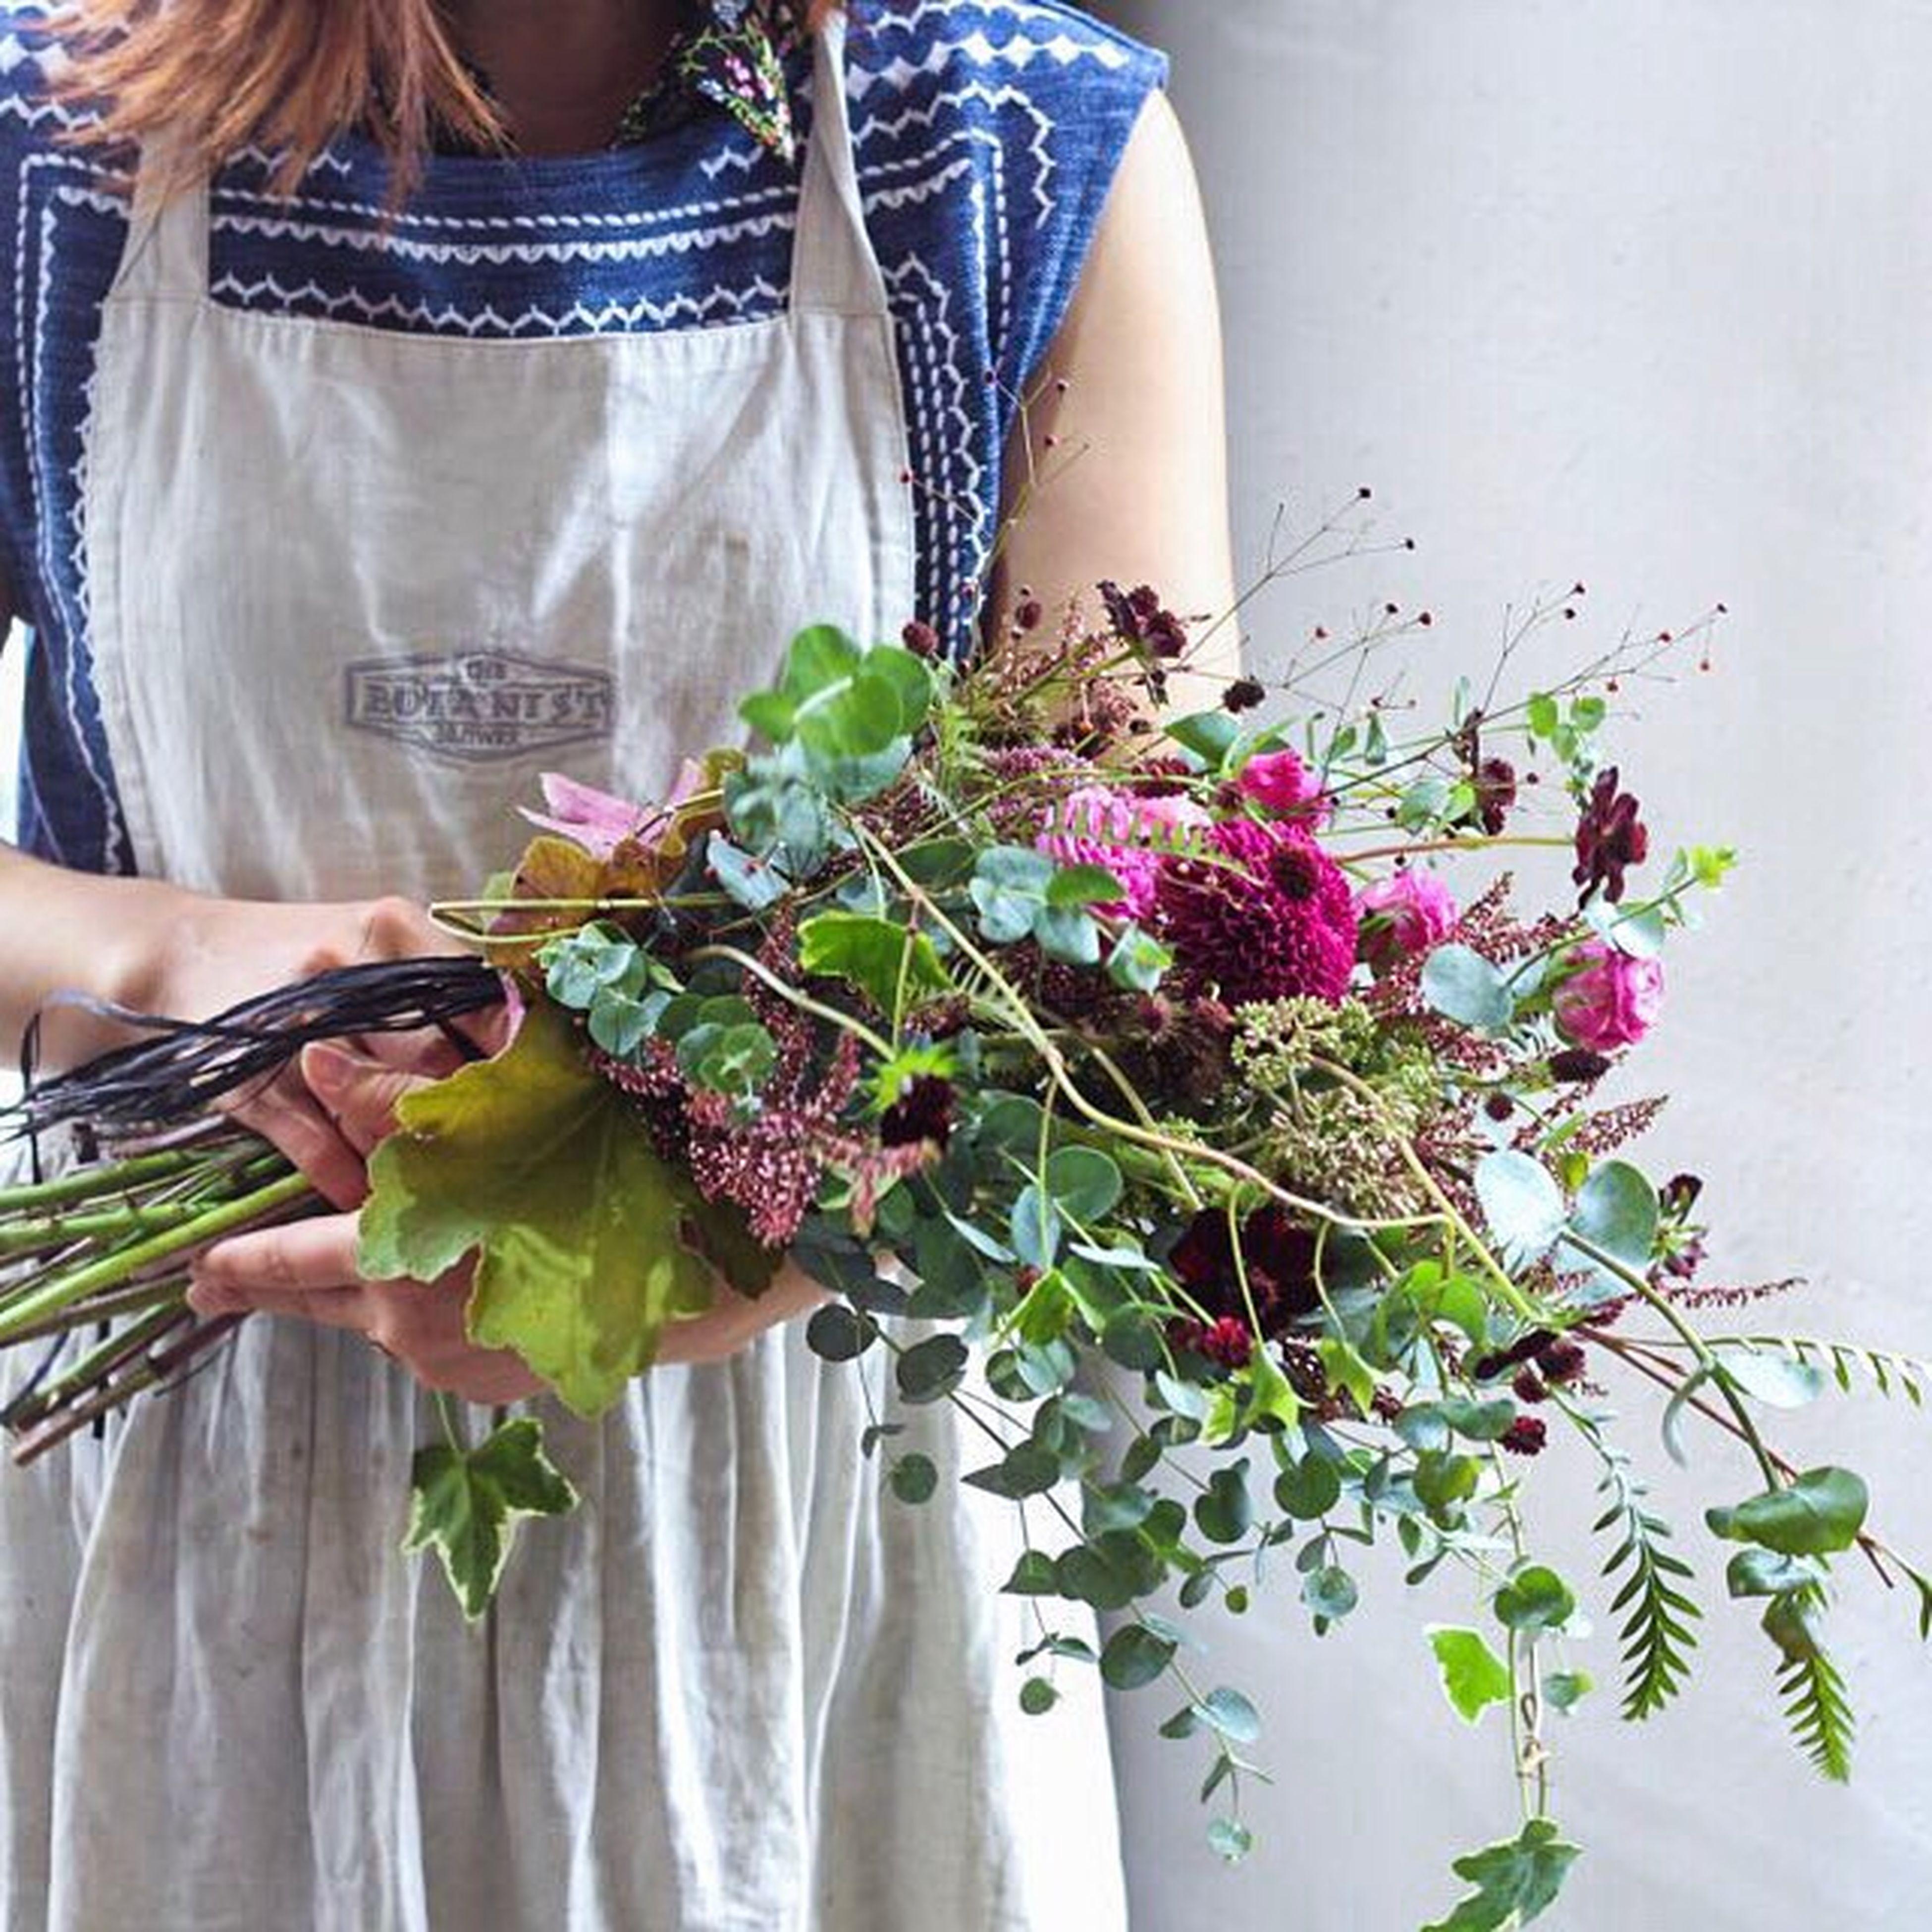 every growup! fighting!! Flower BOTANIST JANUS Suwon, Korea